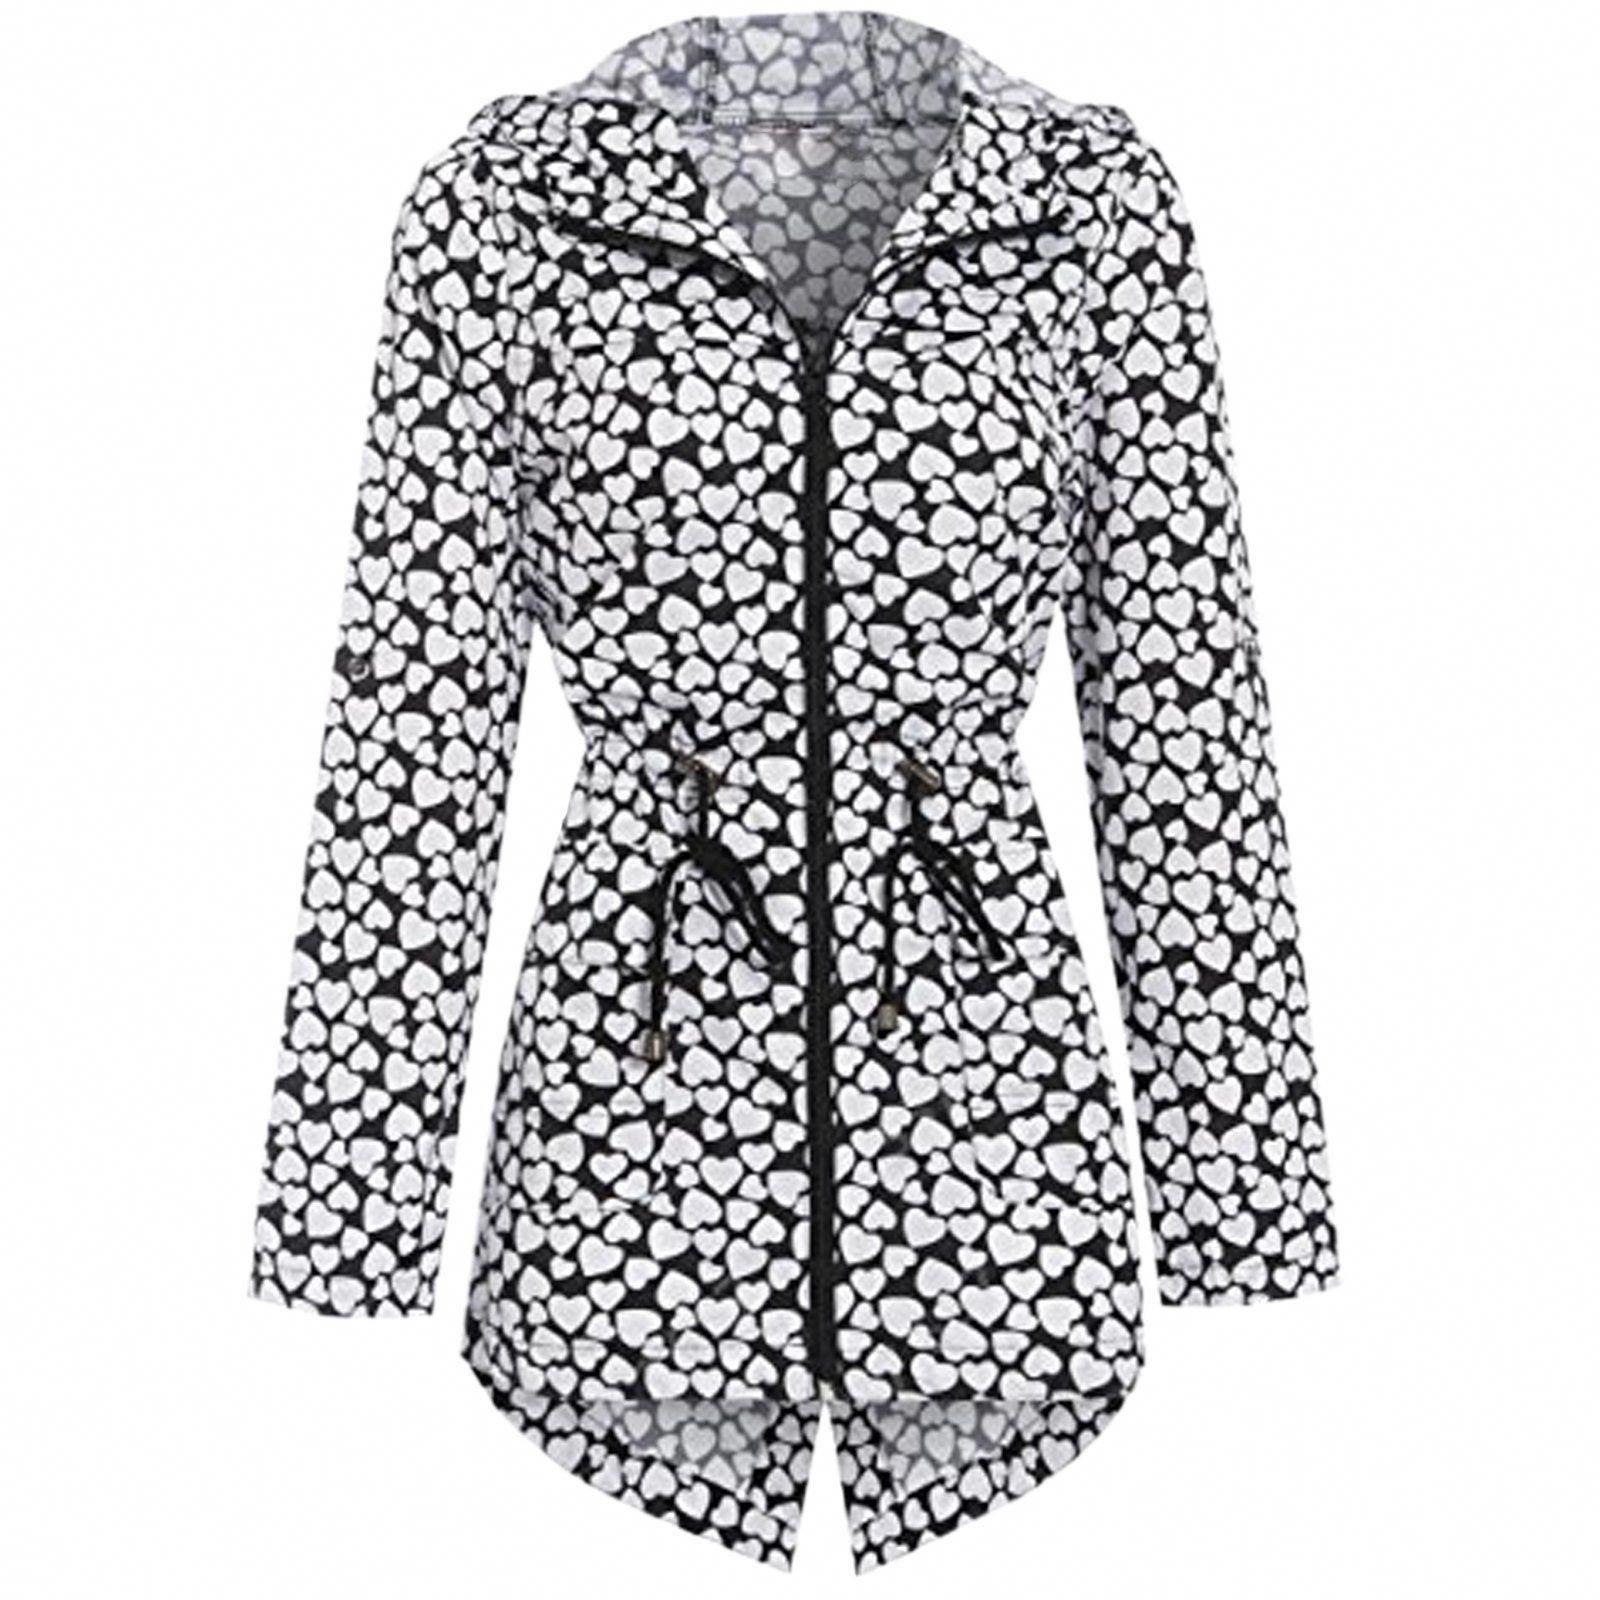 e510f9e0022 Ladies Women Girls Rain Mac Raincoat Showerproof Fishtail Cagoule Kagool  Festival Parka Jacket Hooded Lightweight Coat Plus Big Sizes 8-24   Amazon.co.uk  ...